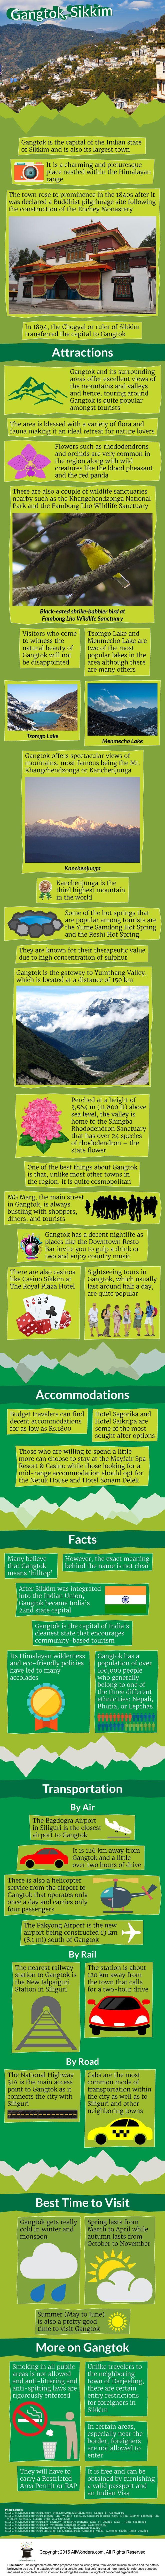 Gangtok Travel Infographic